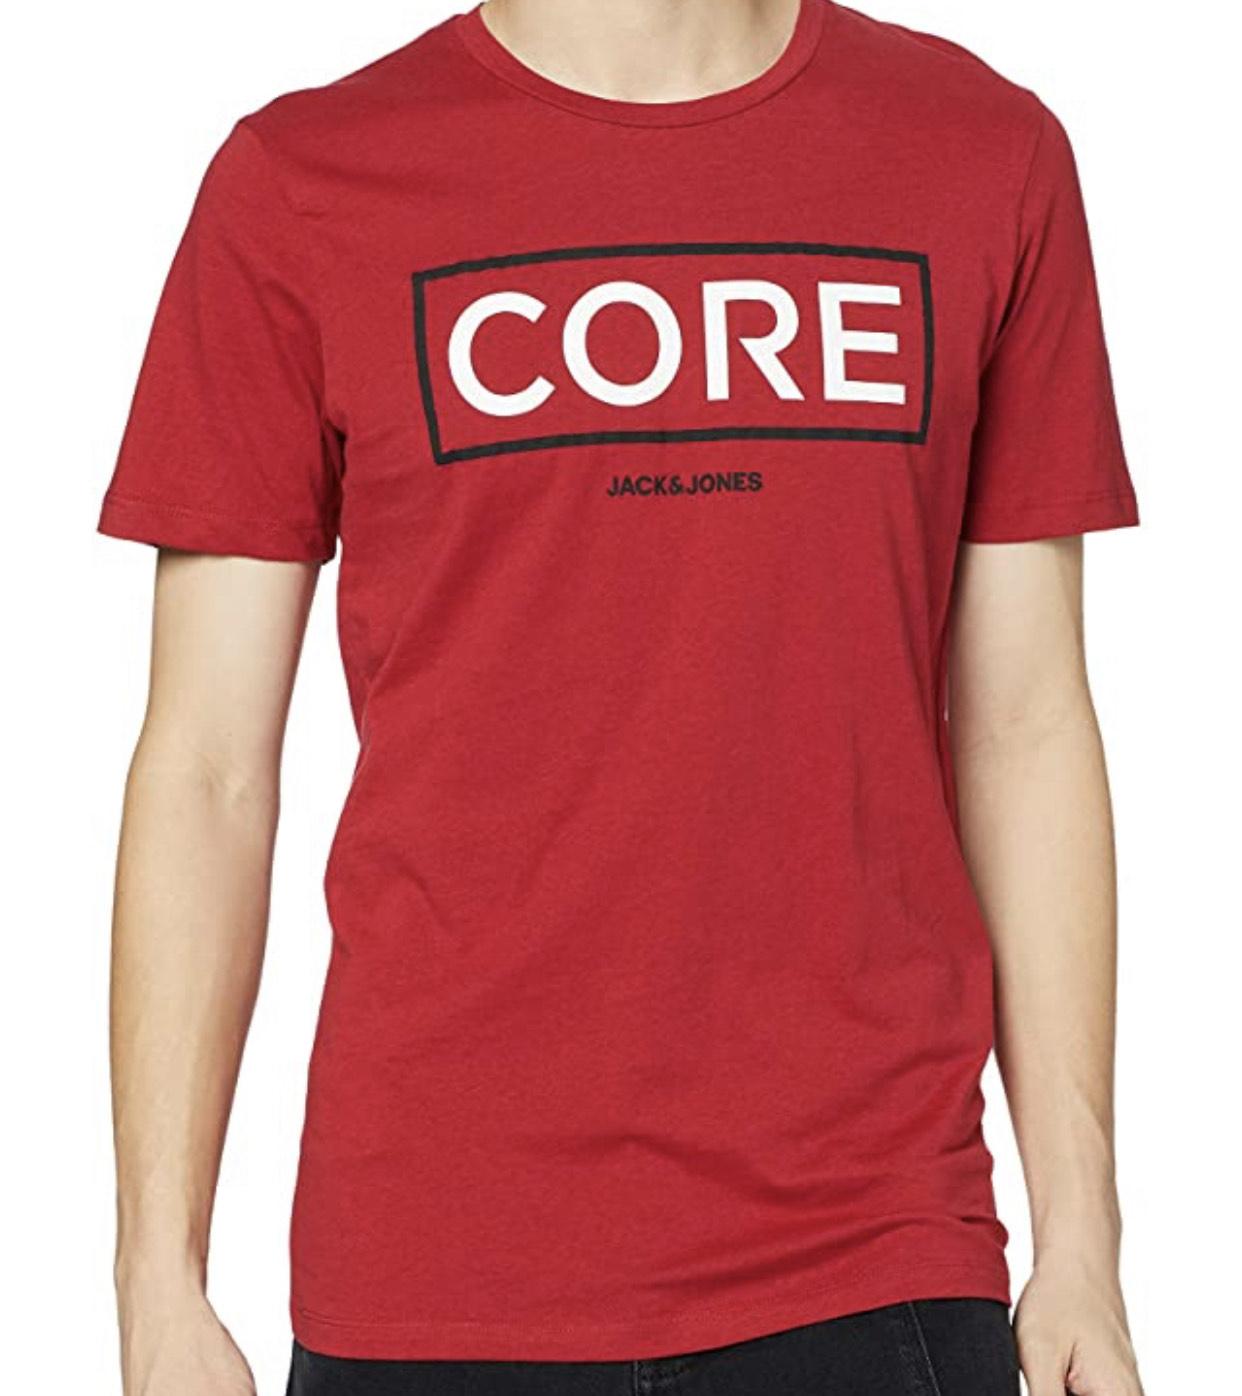 Camiseta Jack & Jones talla M